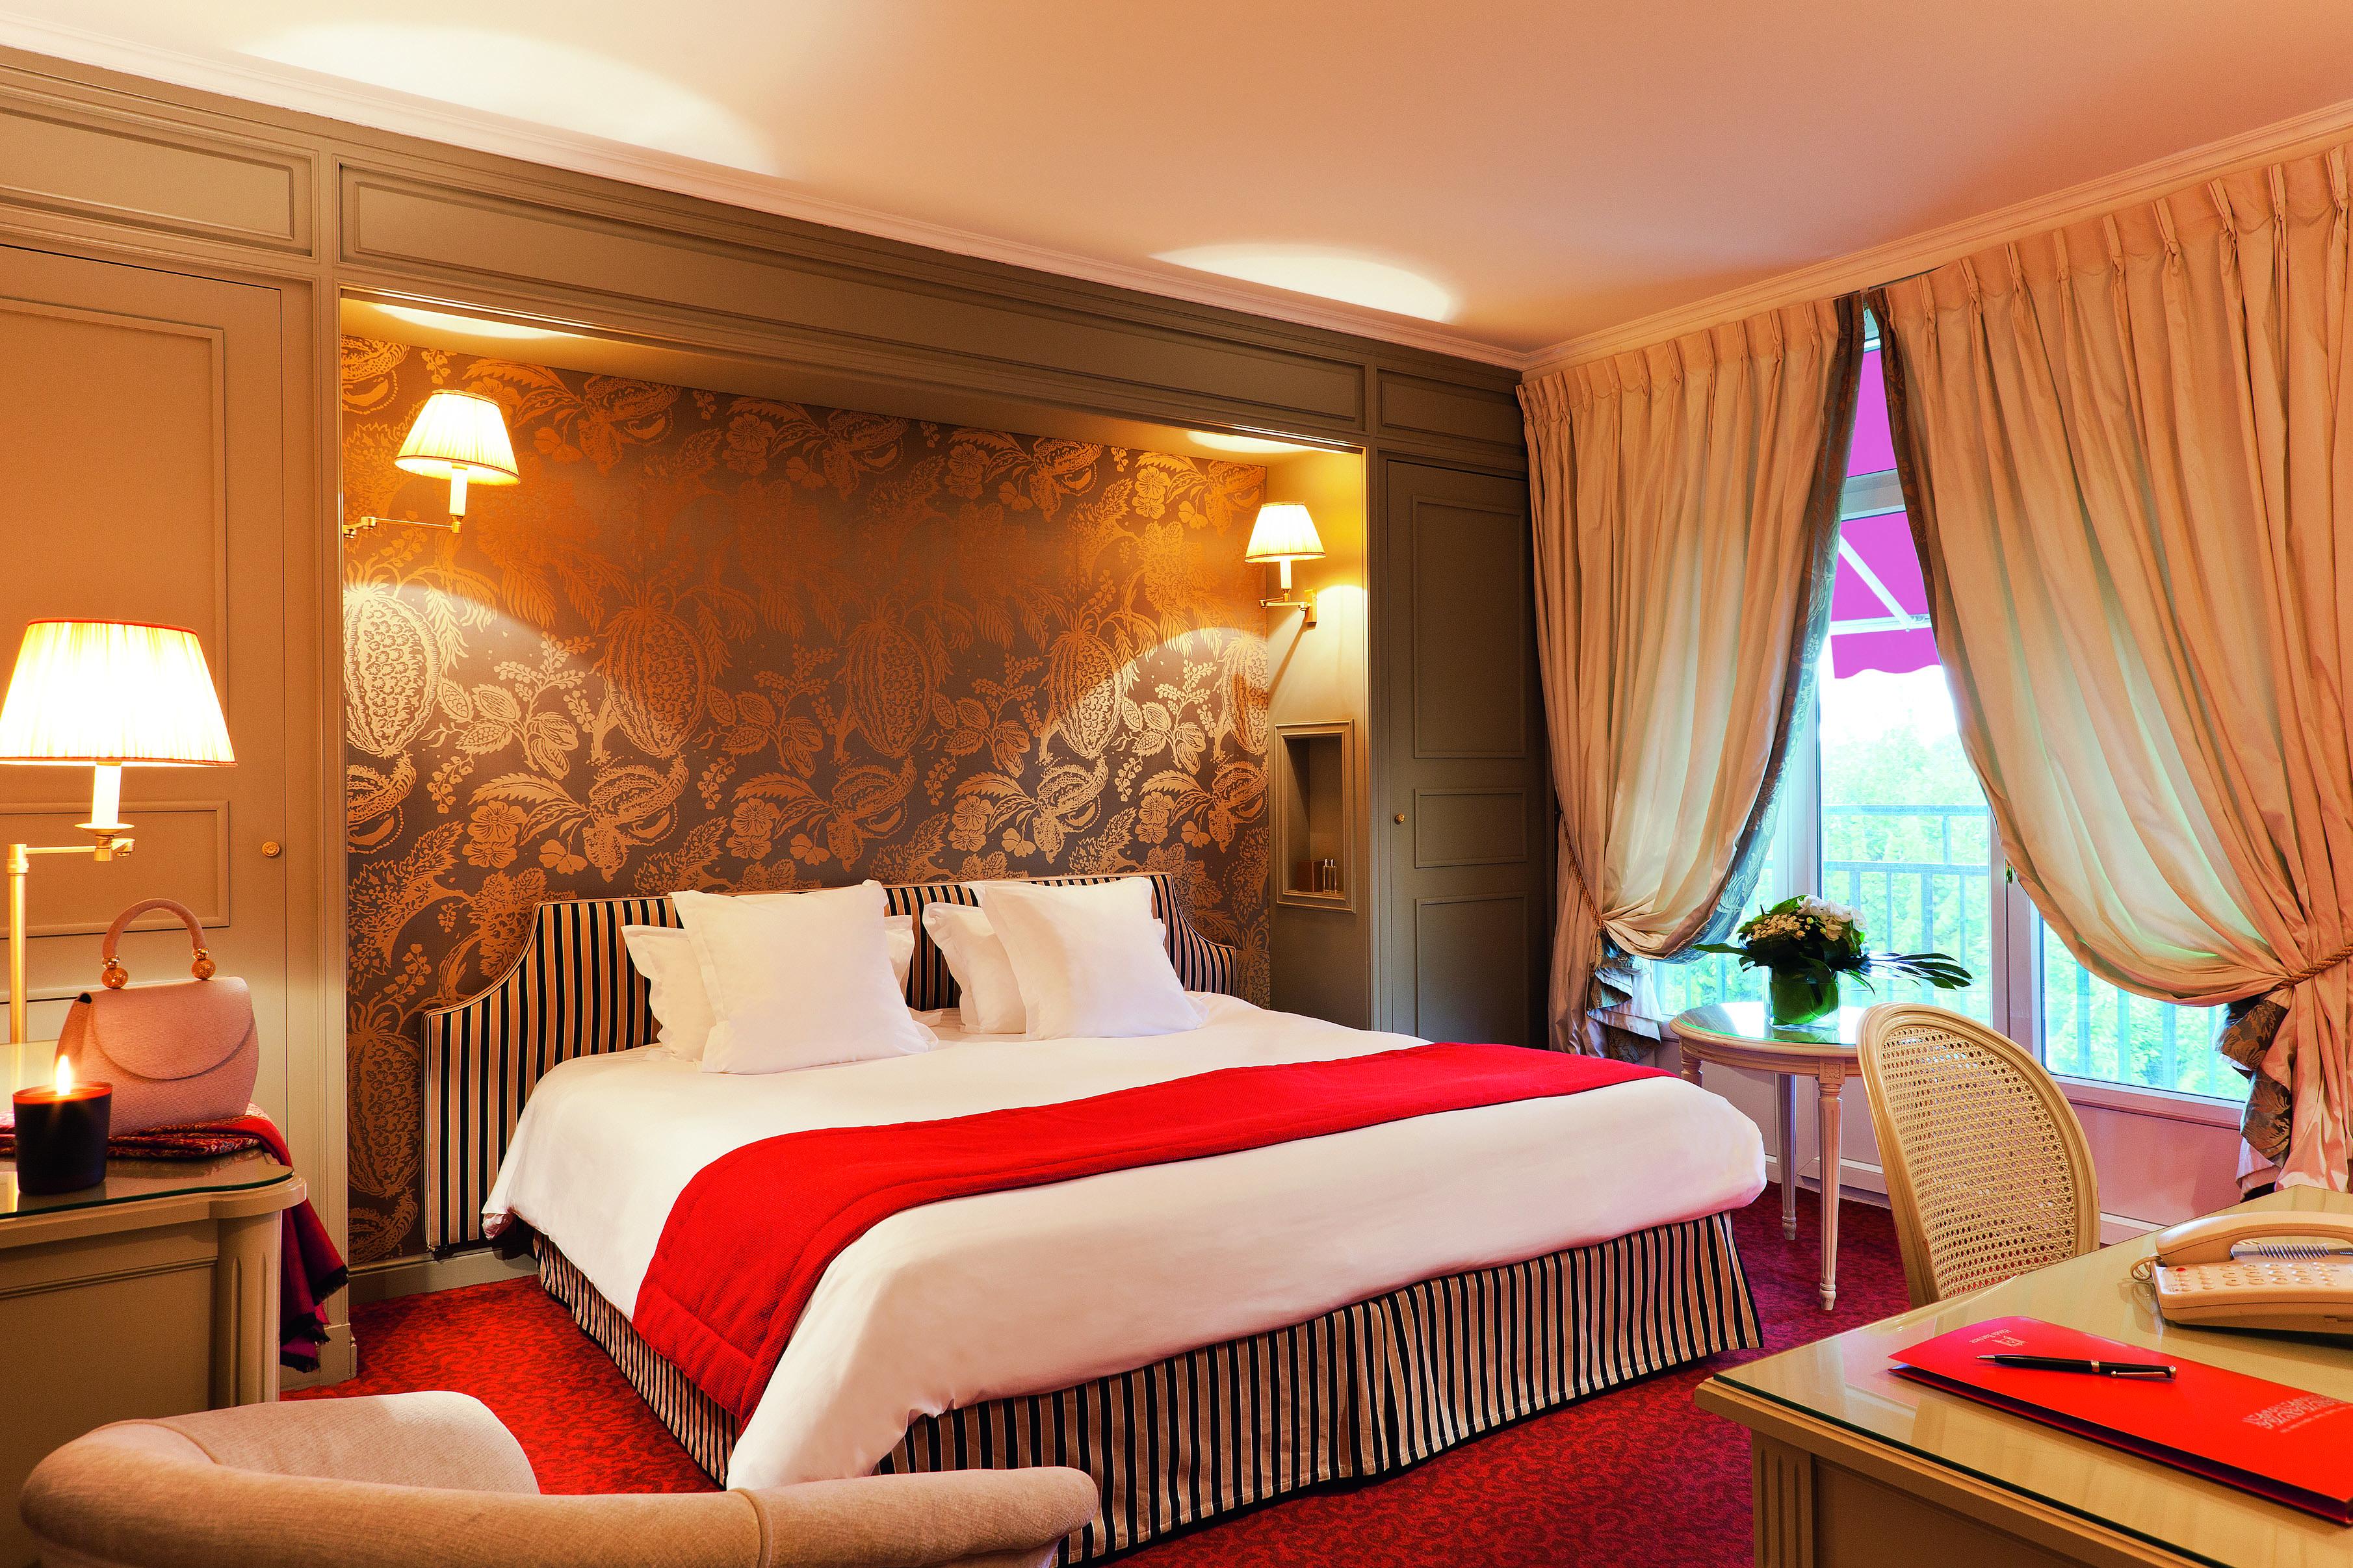 Classic hotel room photo